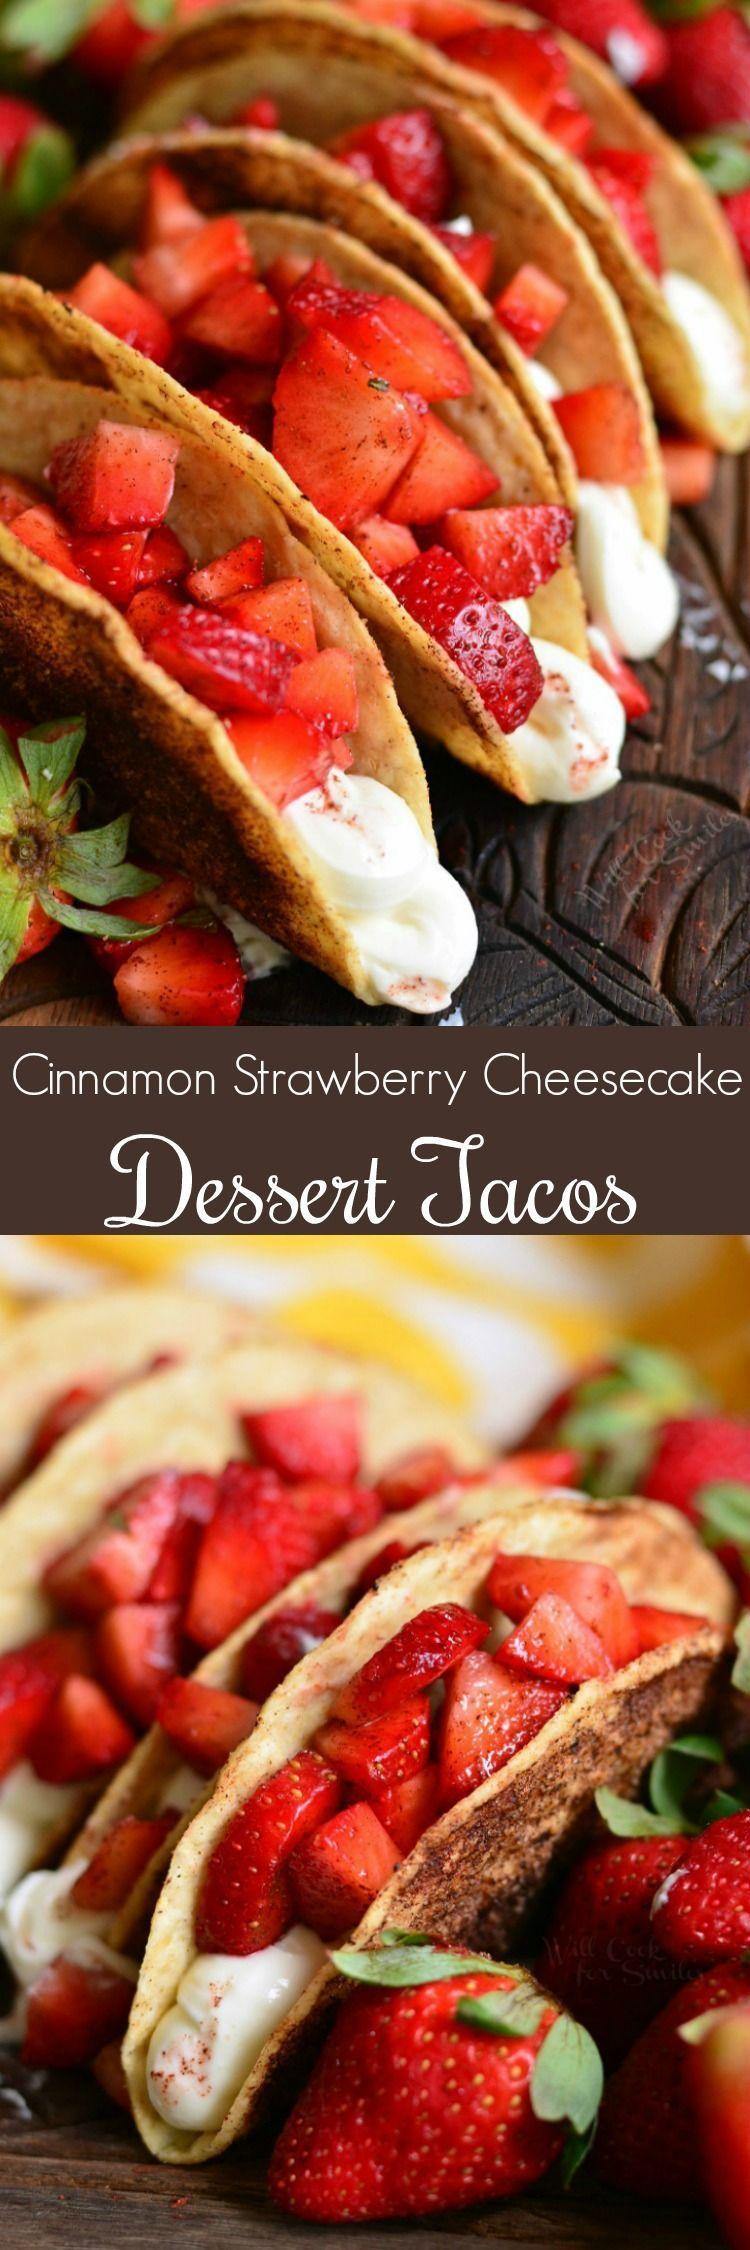 Photo of Cinnamon Strawberry Cheesecake Dessert Tacos. Crunchy corn taco shells are coate…